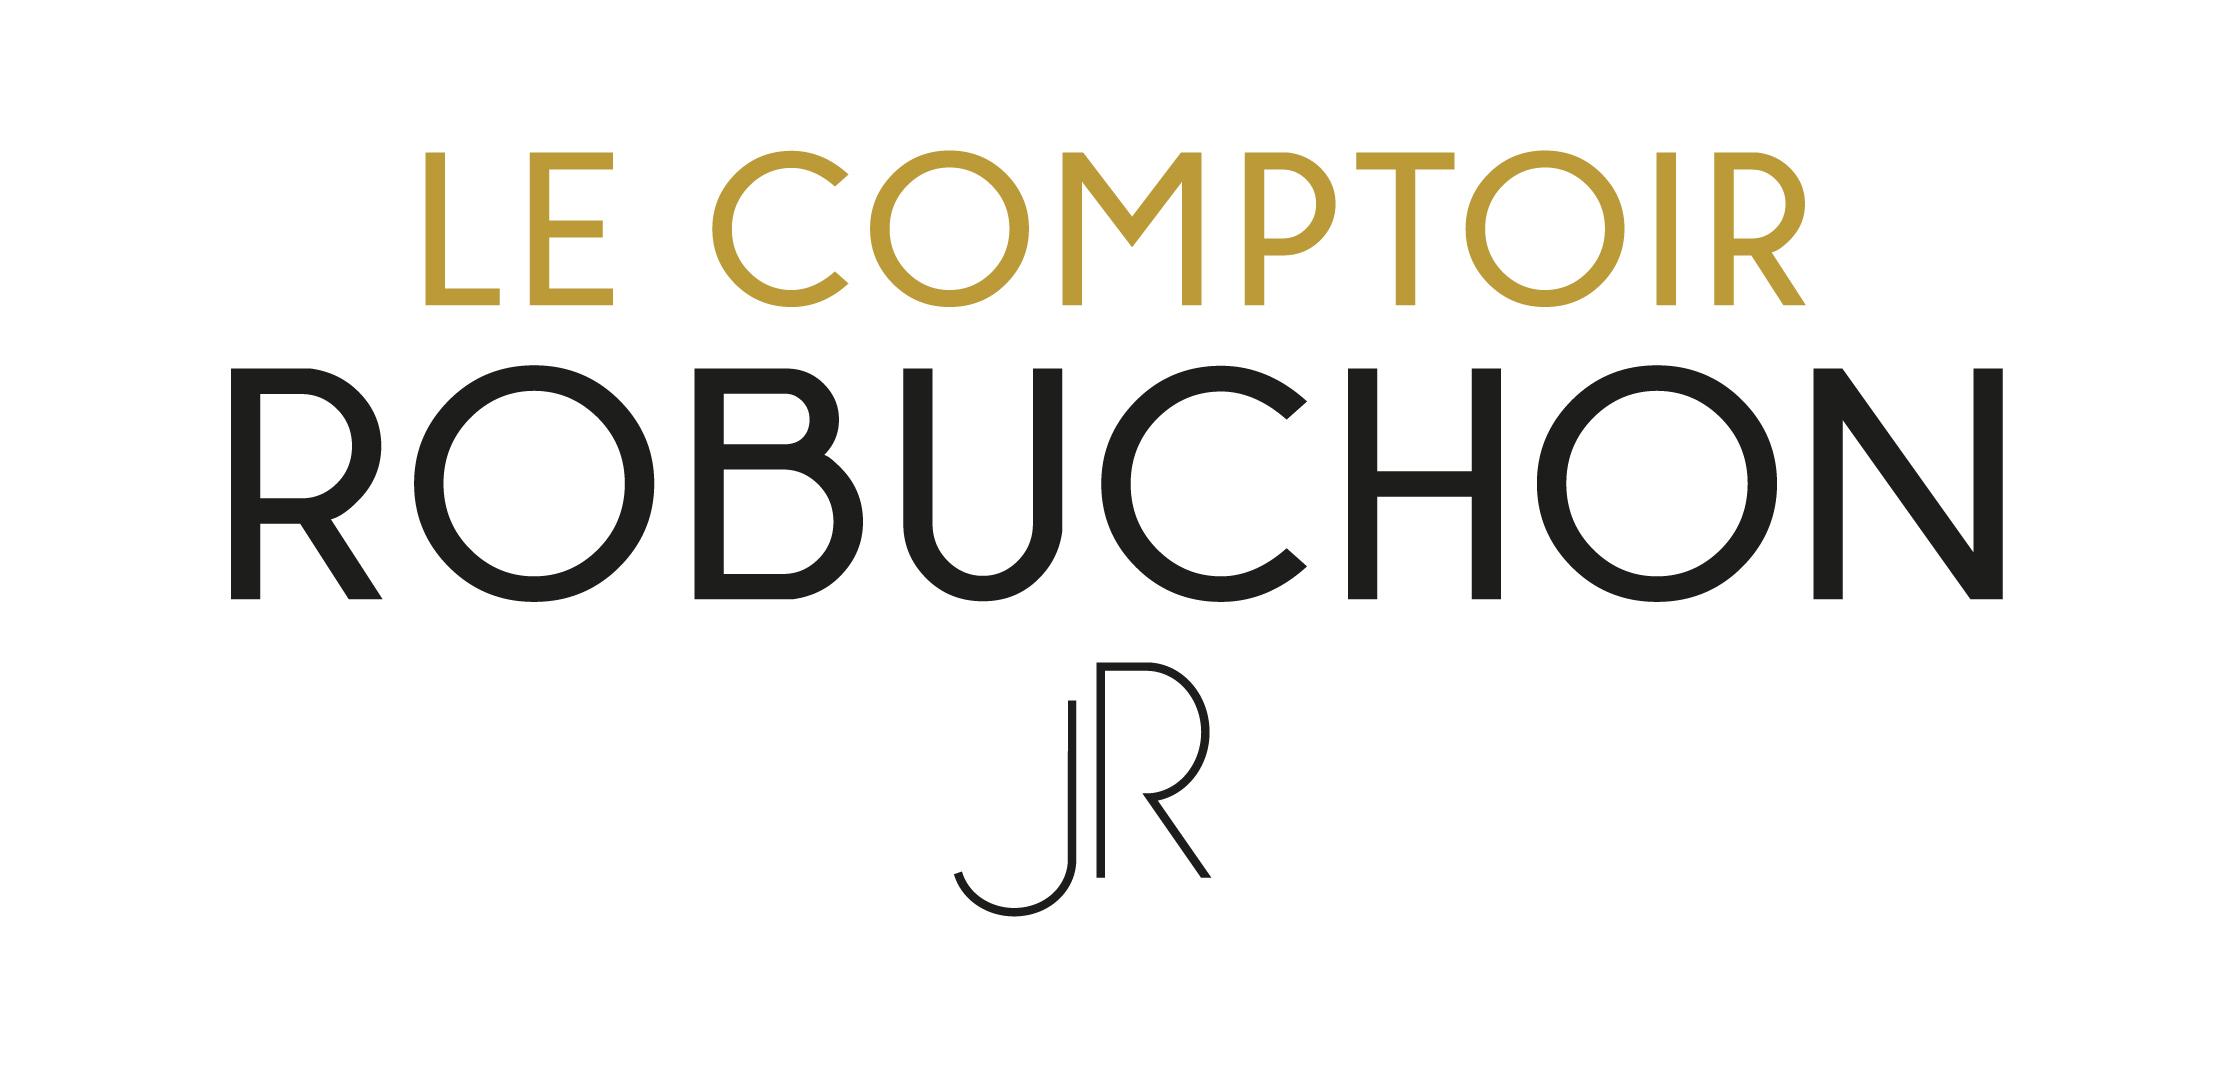 JRobuchon_Le Comptoir_logotype_white background_HD